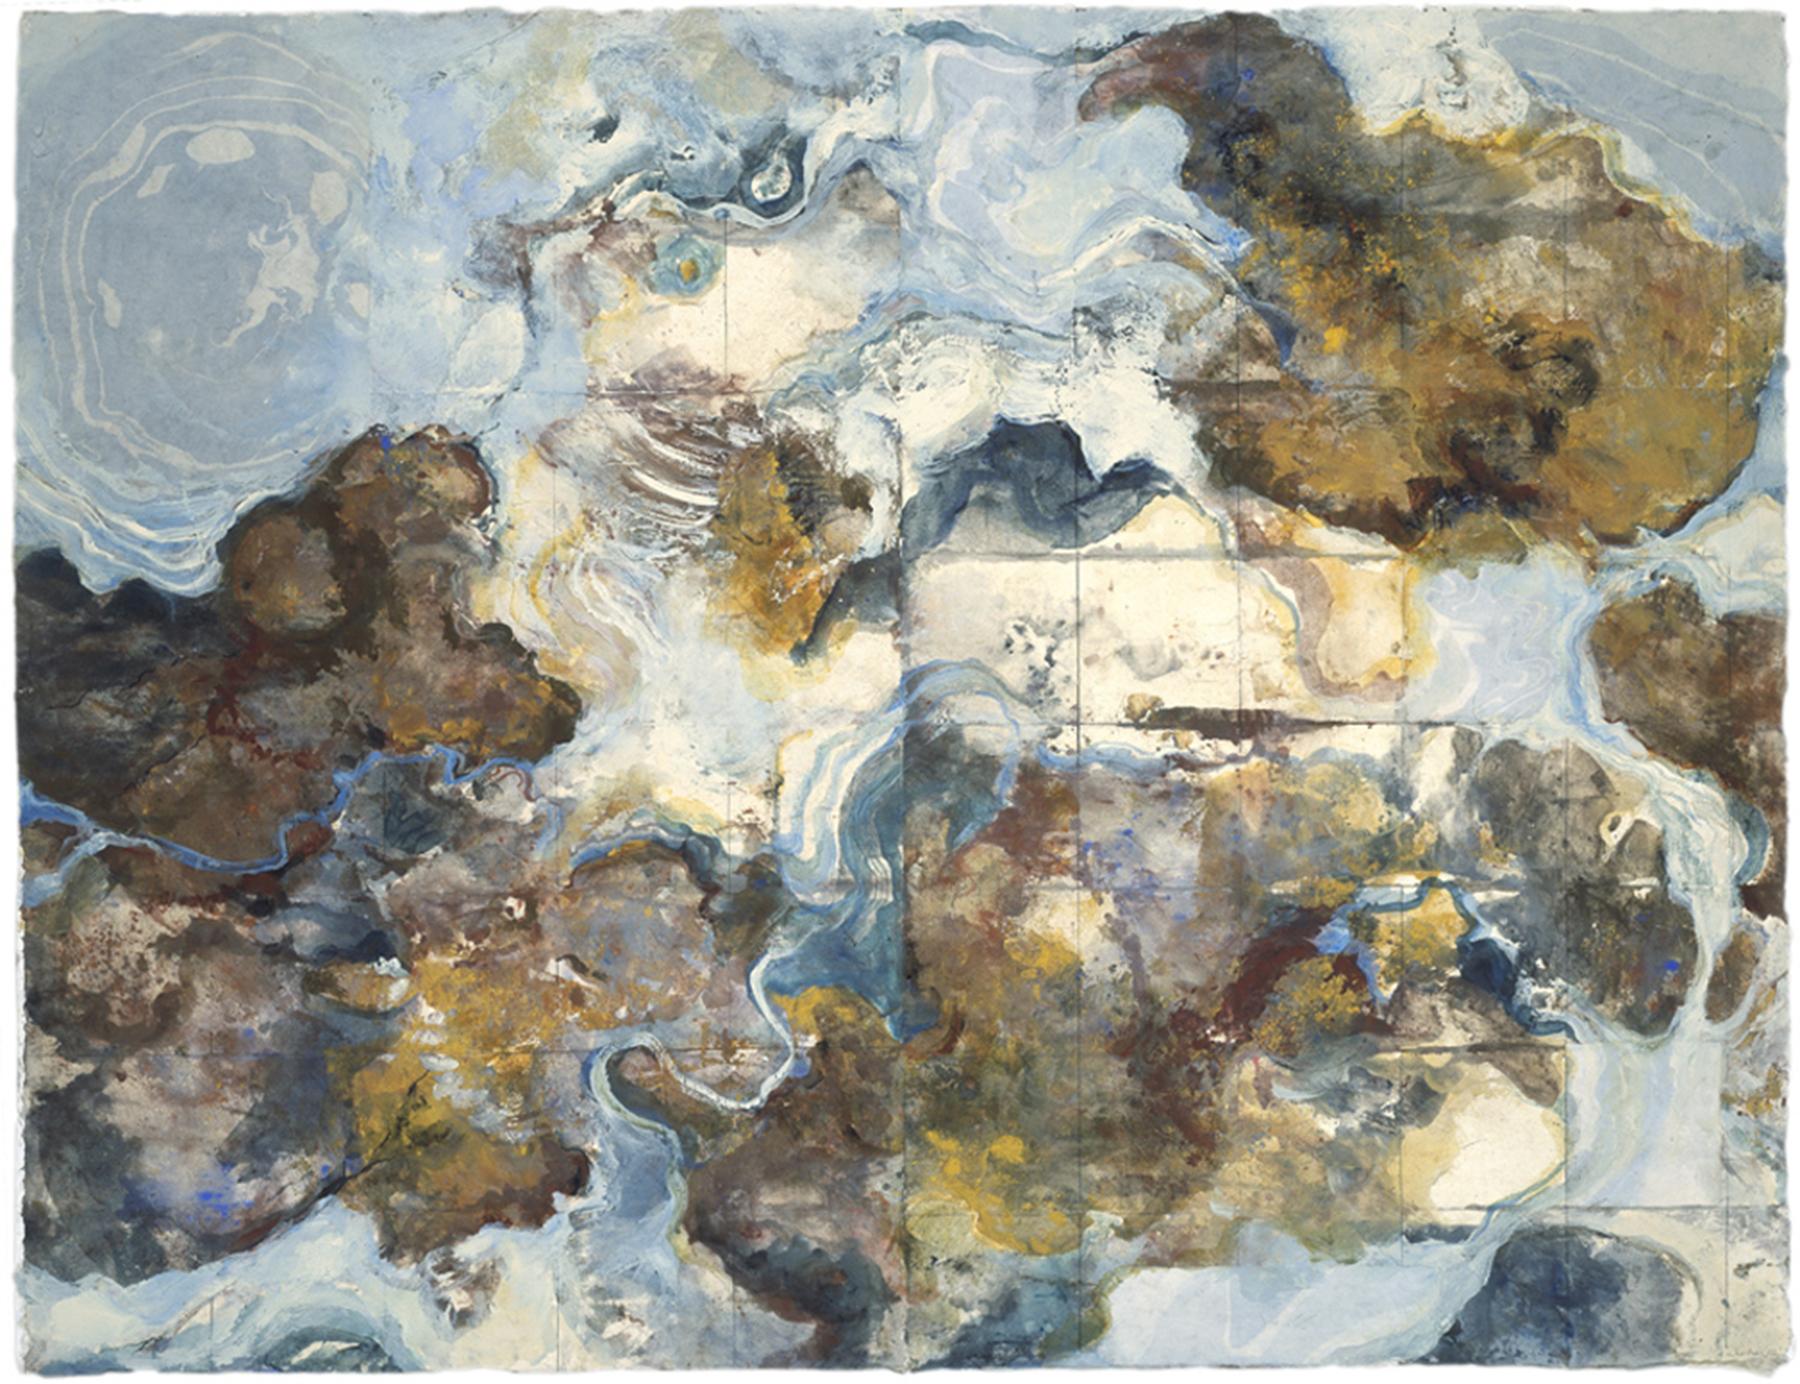 Mary Heebner - Geomancy